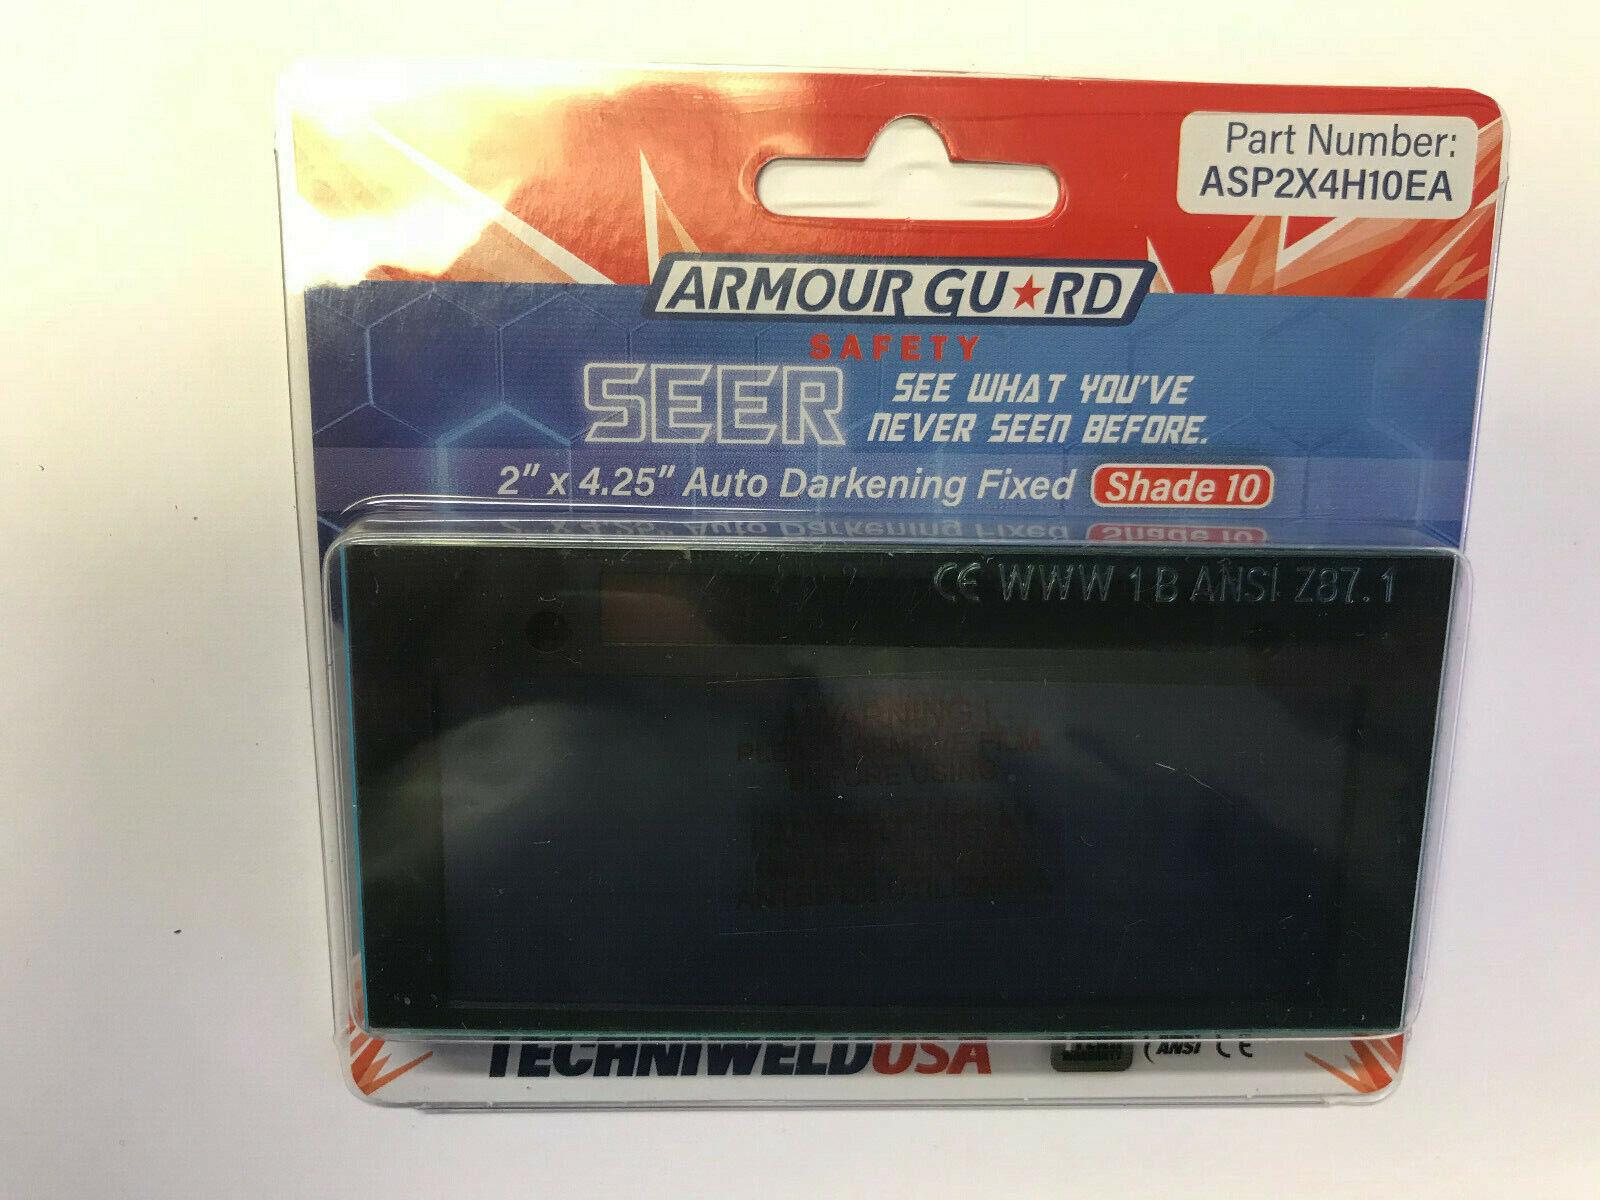 Techniweld Armour Guard Seer Auto Darkening Welding Lens 2 x 4 Shade 10